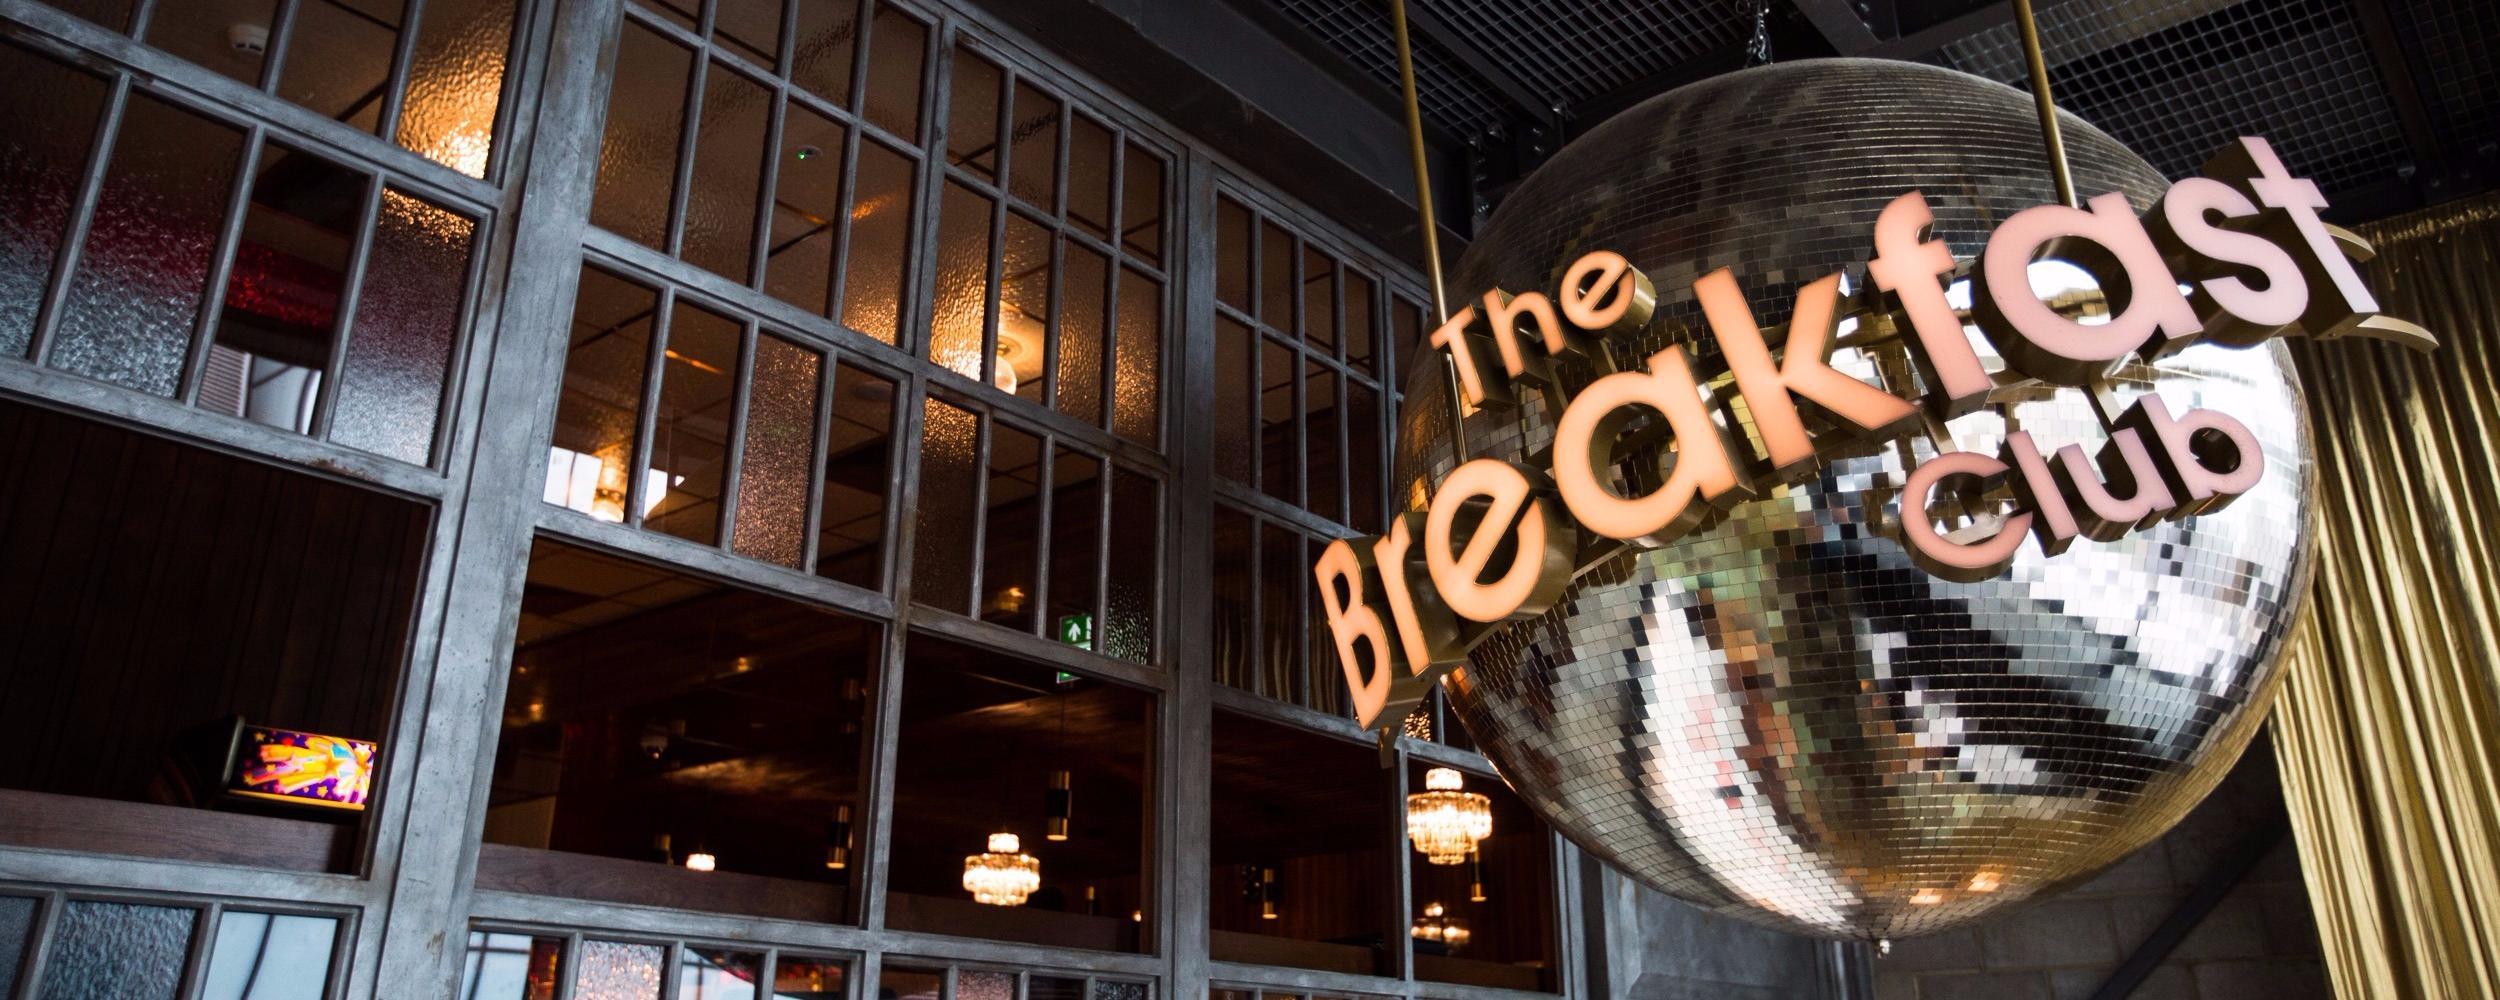 The Breakfast Club Canary Wharf & The Breakfast Pub Brand Cover